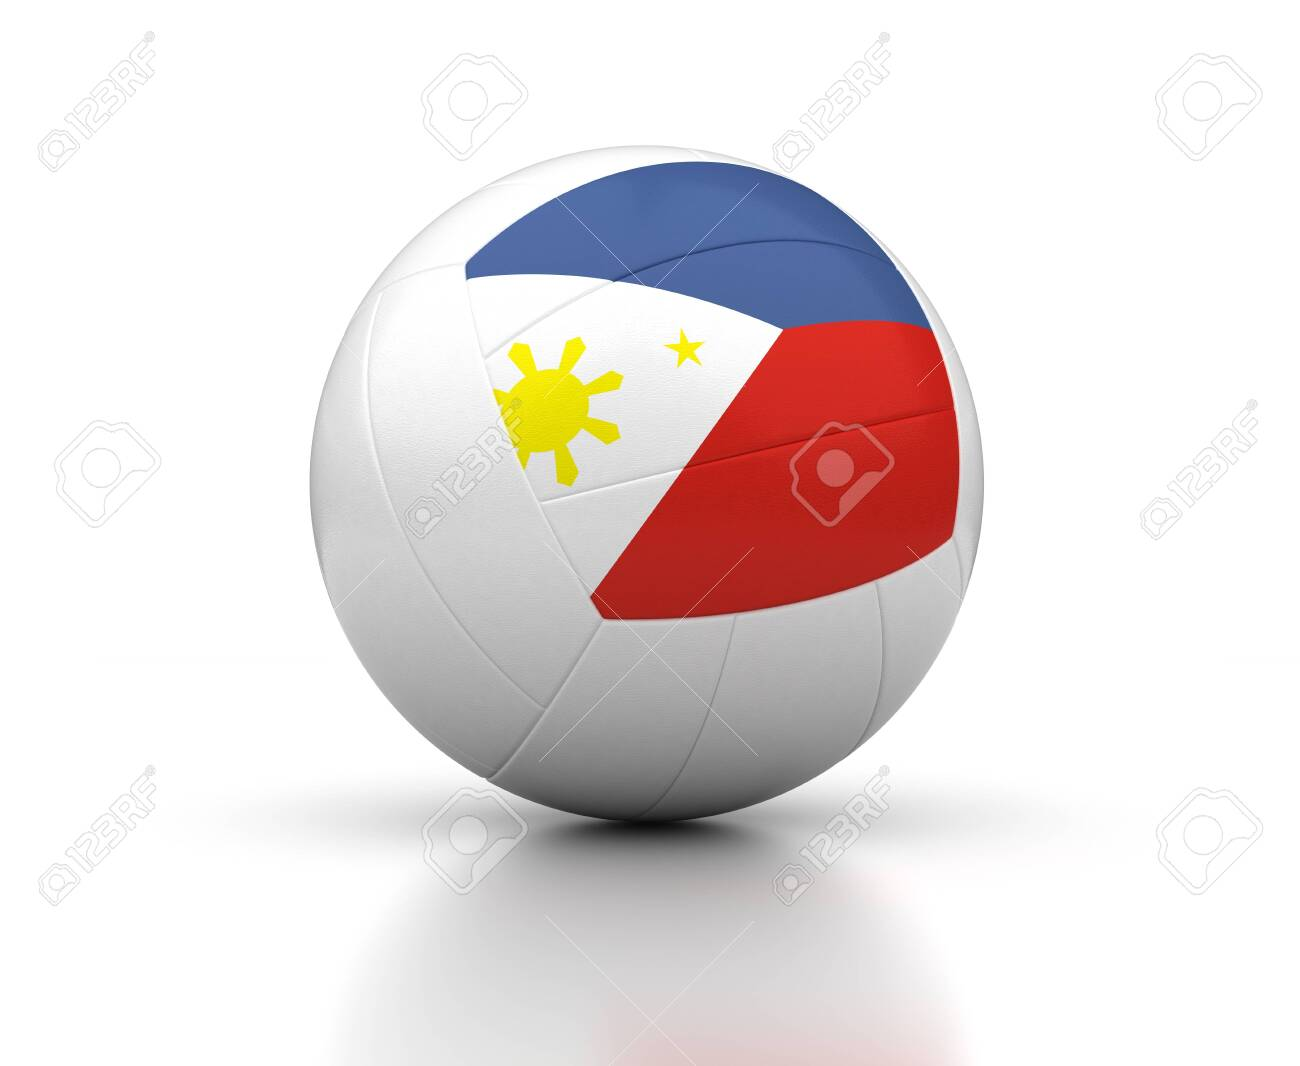 Philippines Volleyball Team - 142619542